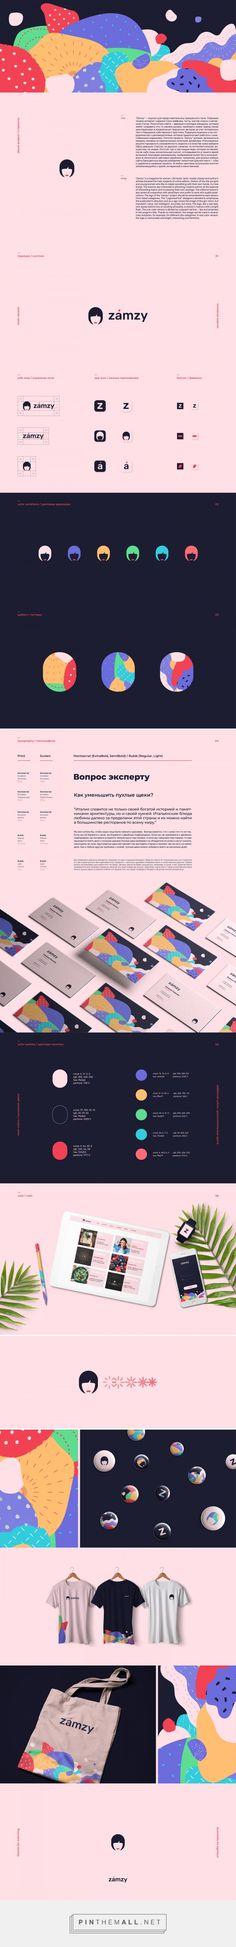 Zamzy Women's Magazine Branding by Logo Machine | Fivestar Branding Agency – Design and Branding Agency & Curated Inspiration Gallery #branding #brand #design #designinspiration #pattern